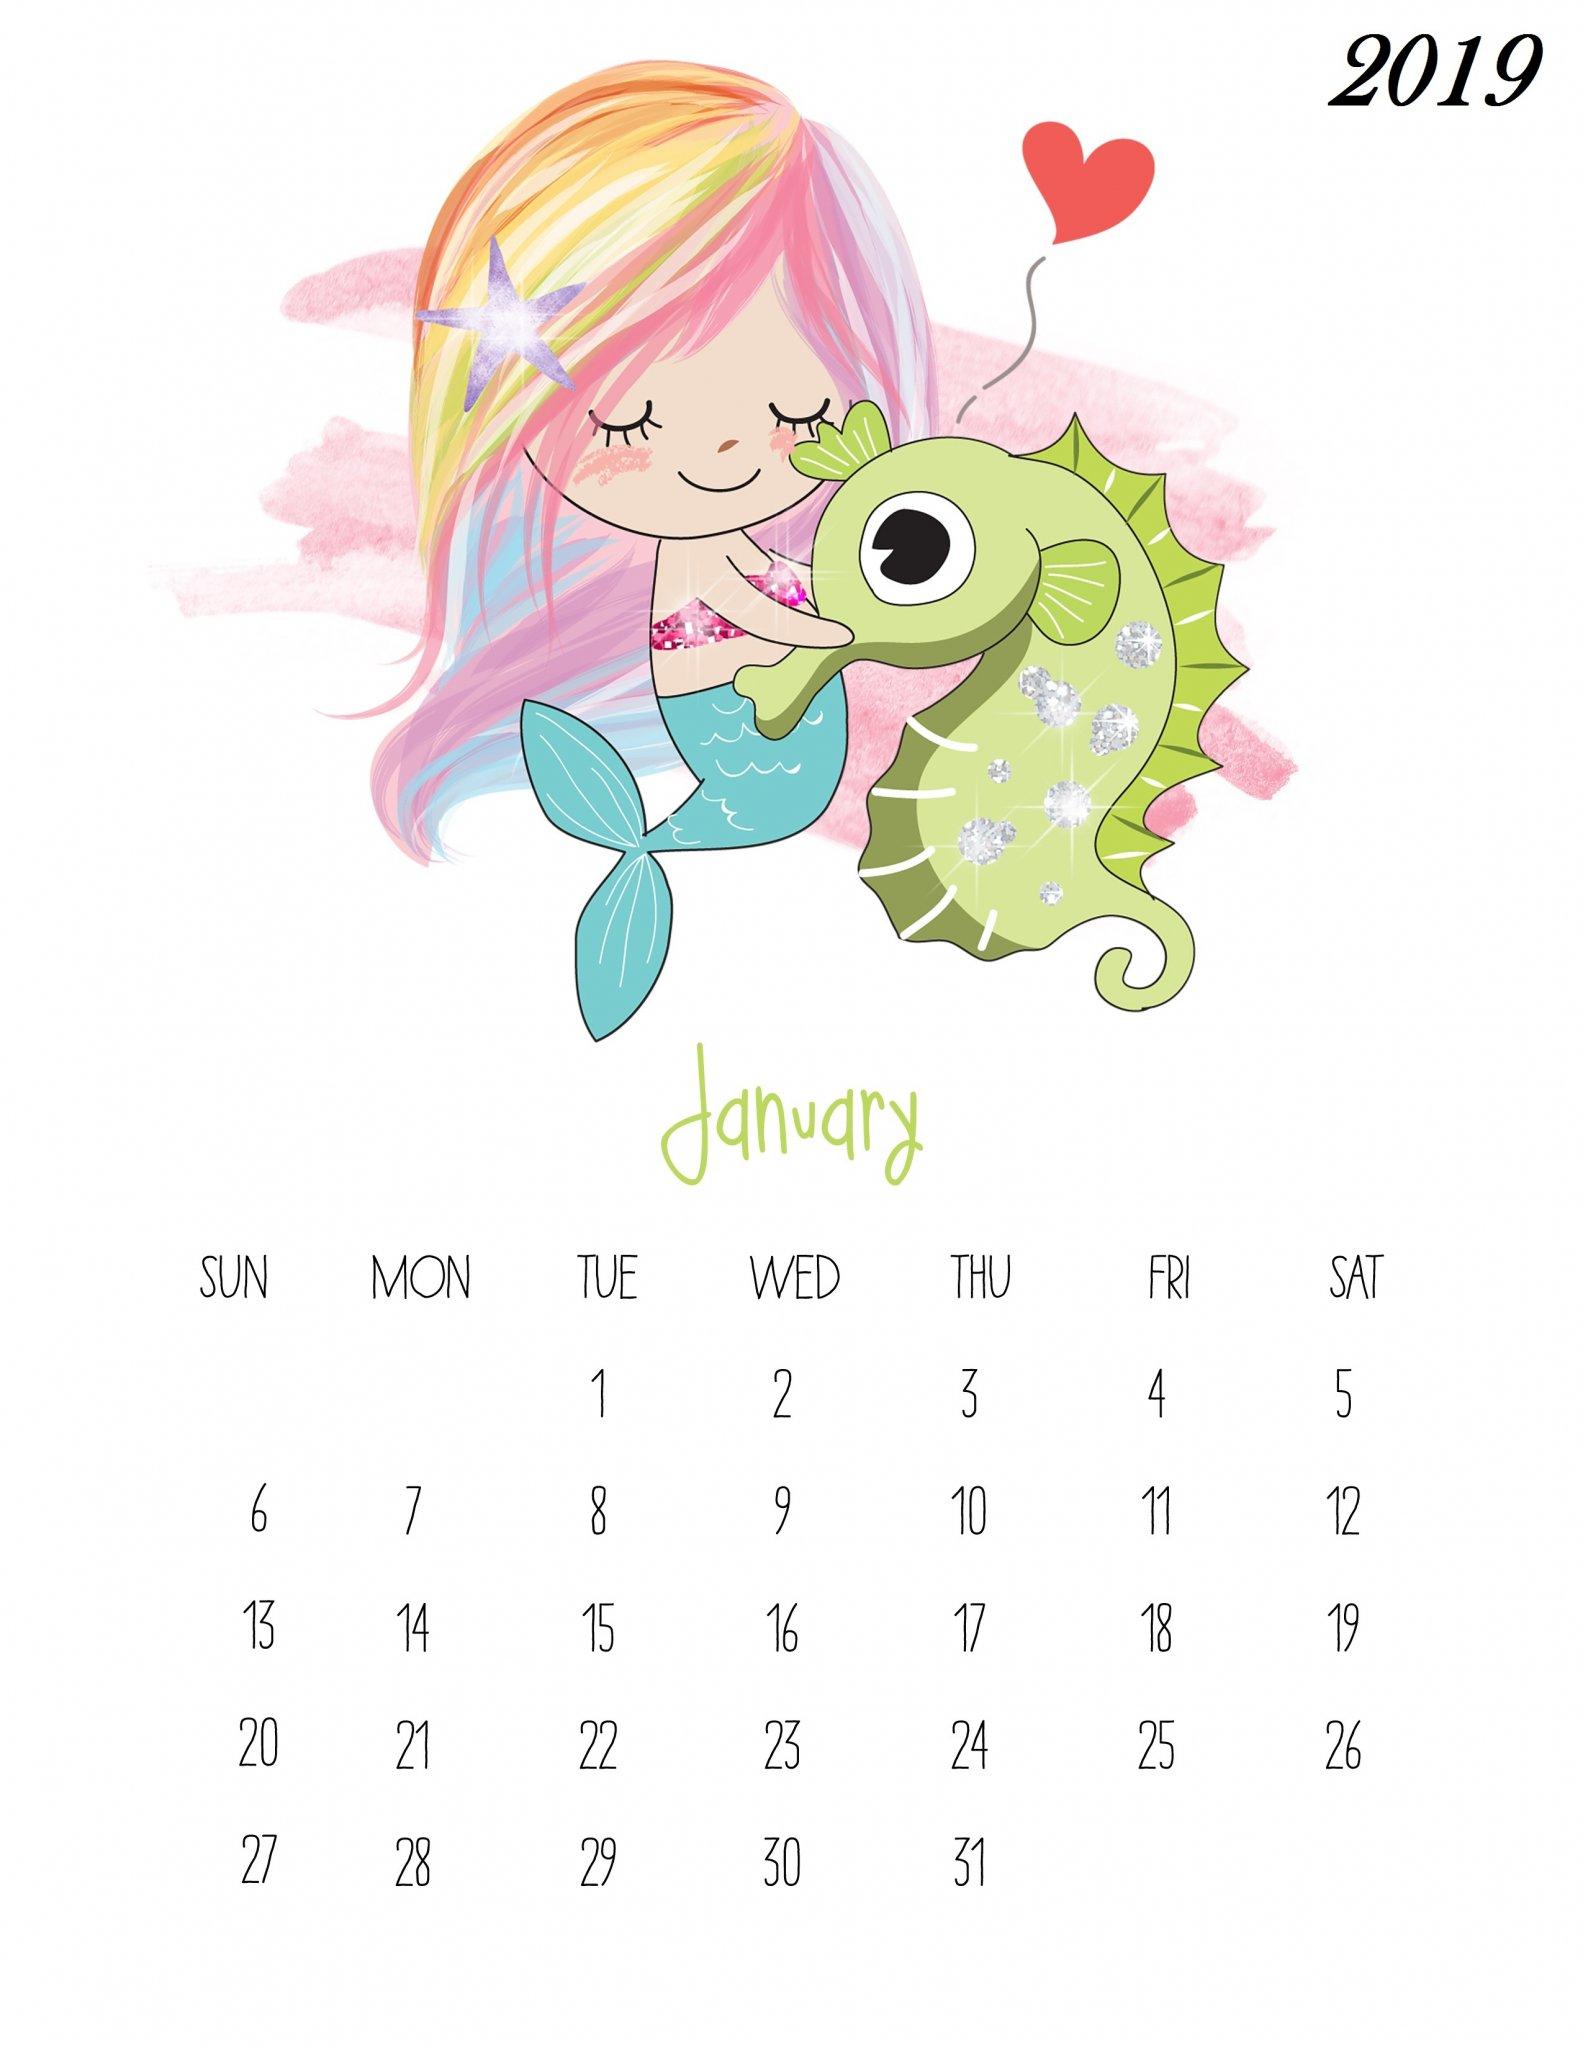 Cute January 2019 Calendar For Kids